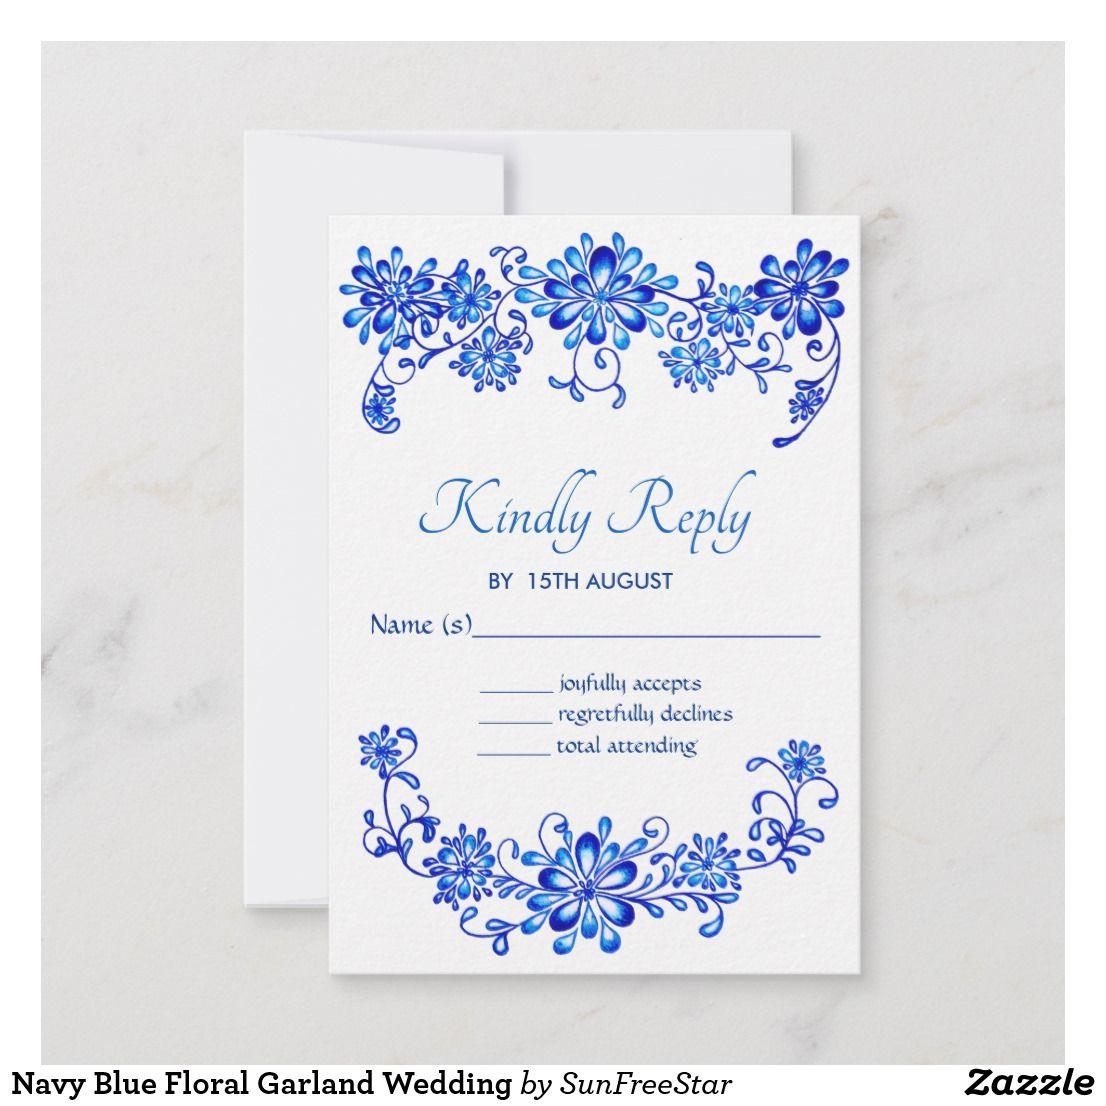 Navy Blue Floral Garland Wedding RSVP Card